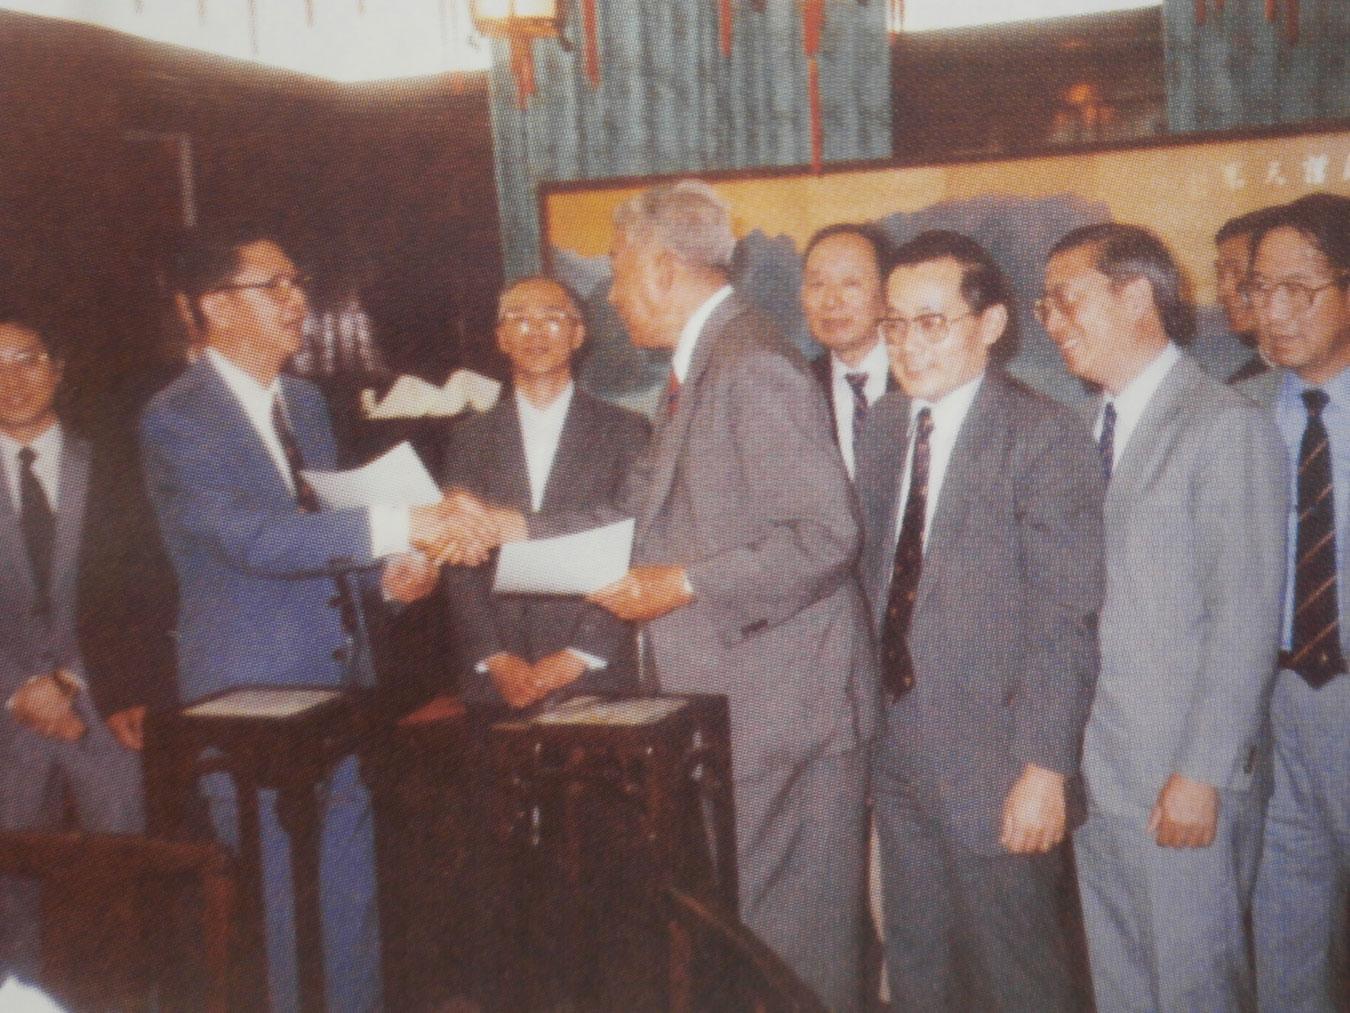 CUHK and the University of Peking on exchange programmes (1984)